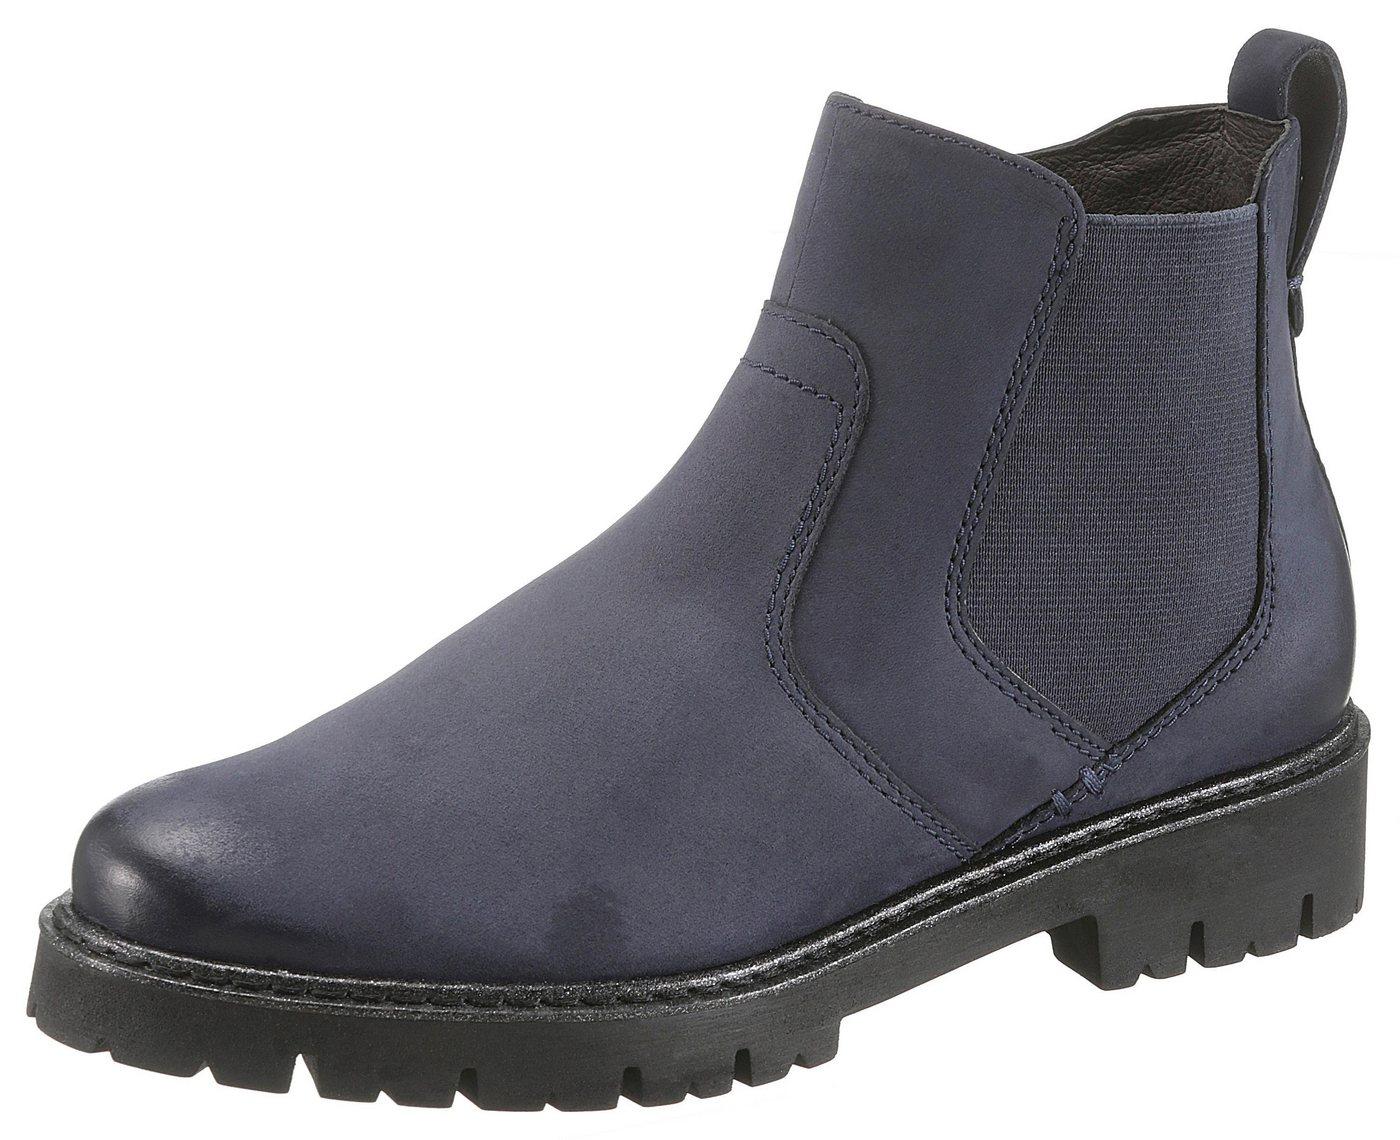 Be Natural Chelseaboots mit Soft Flex Dämpfung | Schuhe > Boots > Chelsea-Boots | Blau | Jeans | Be Natural